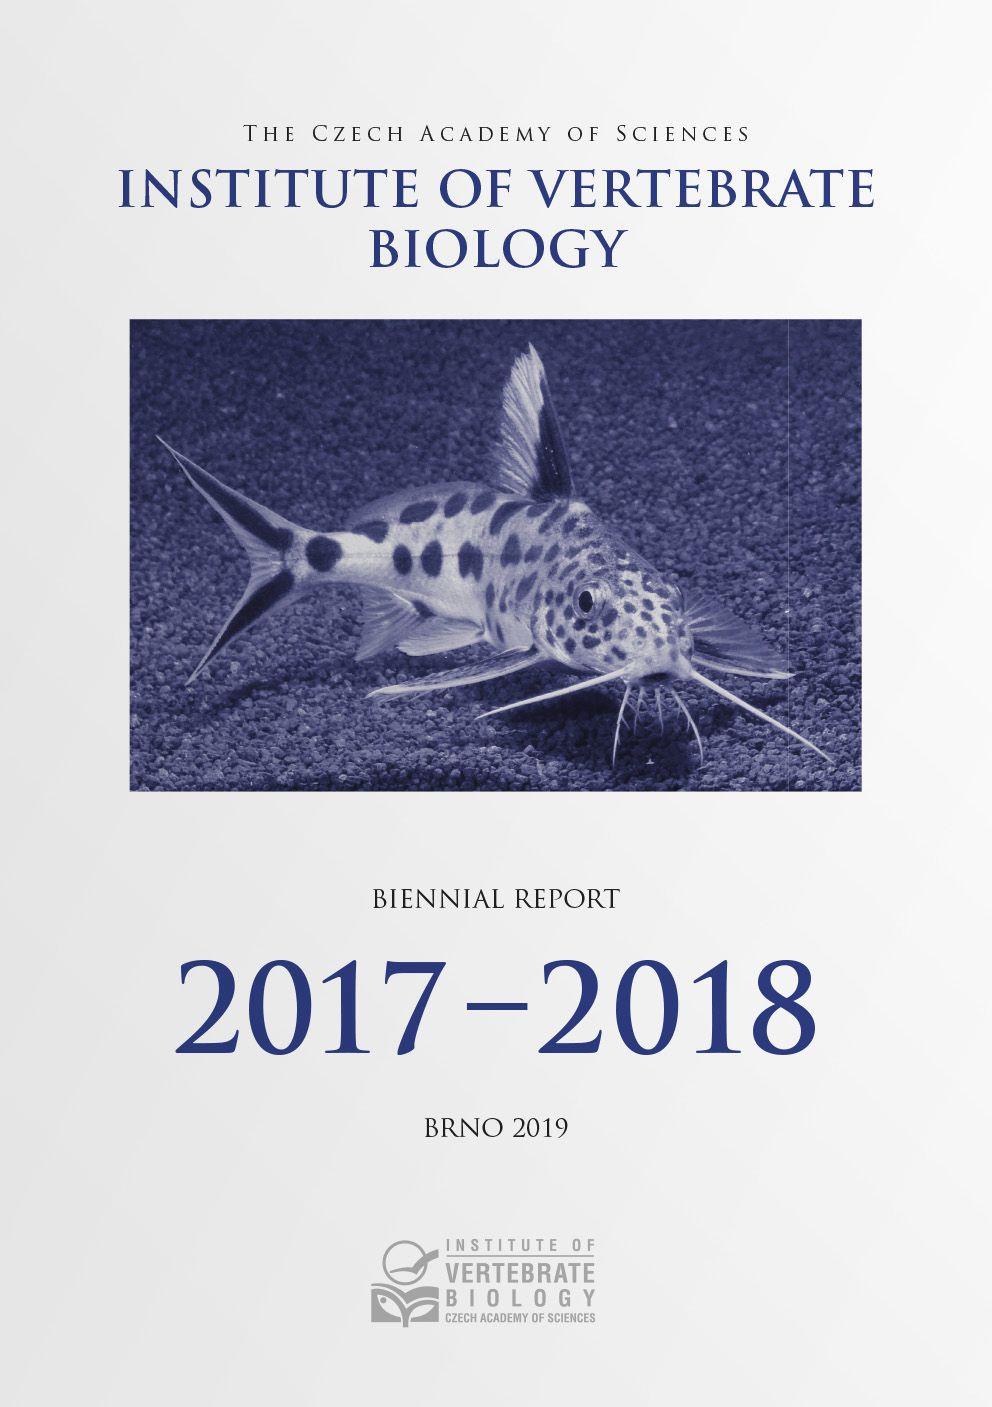 Biennial Report 2017-2018